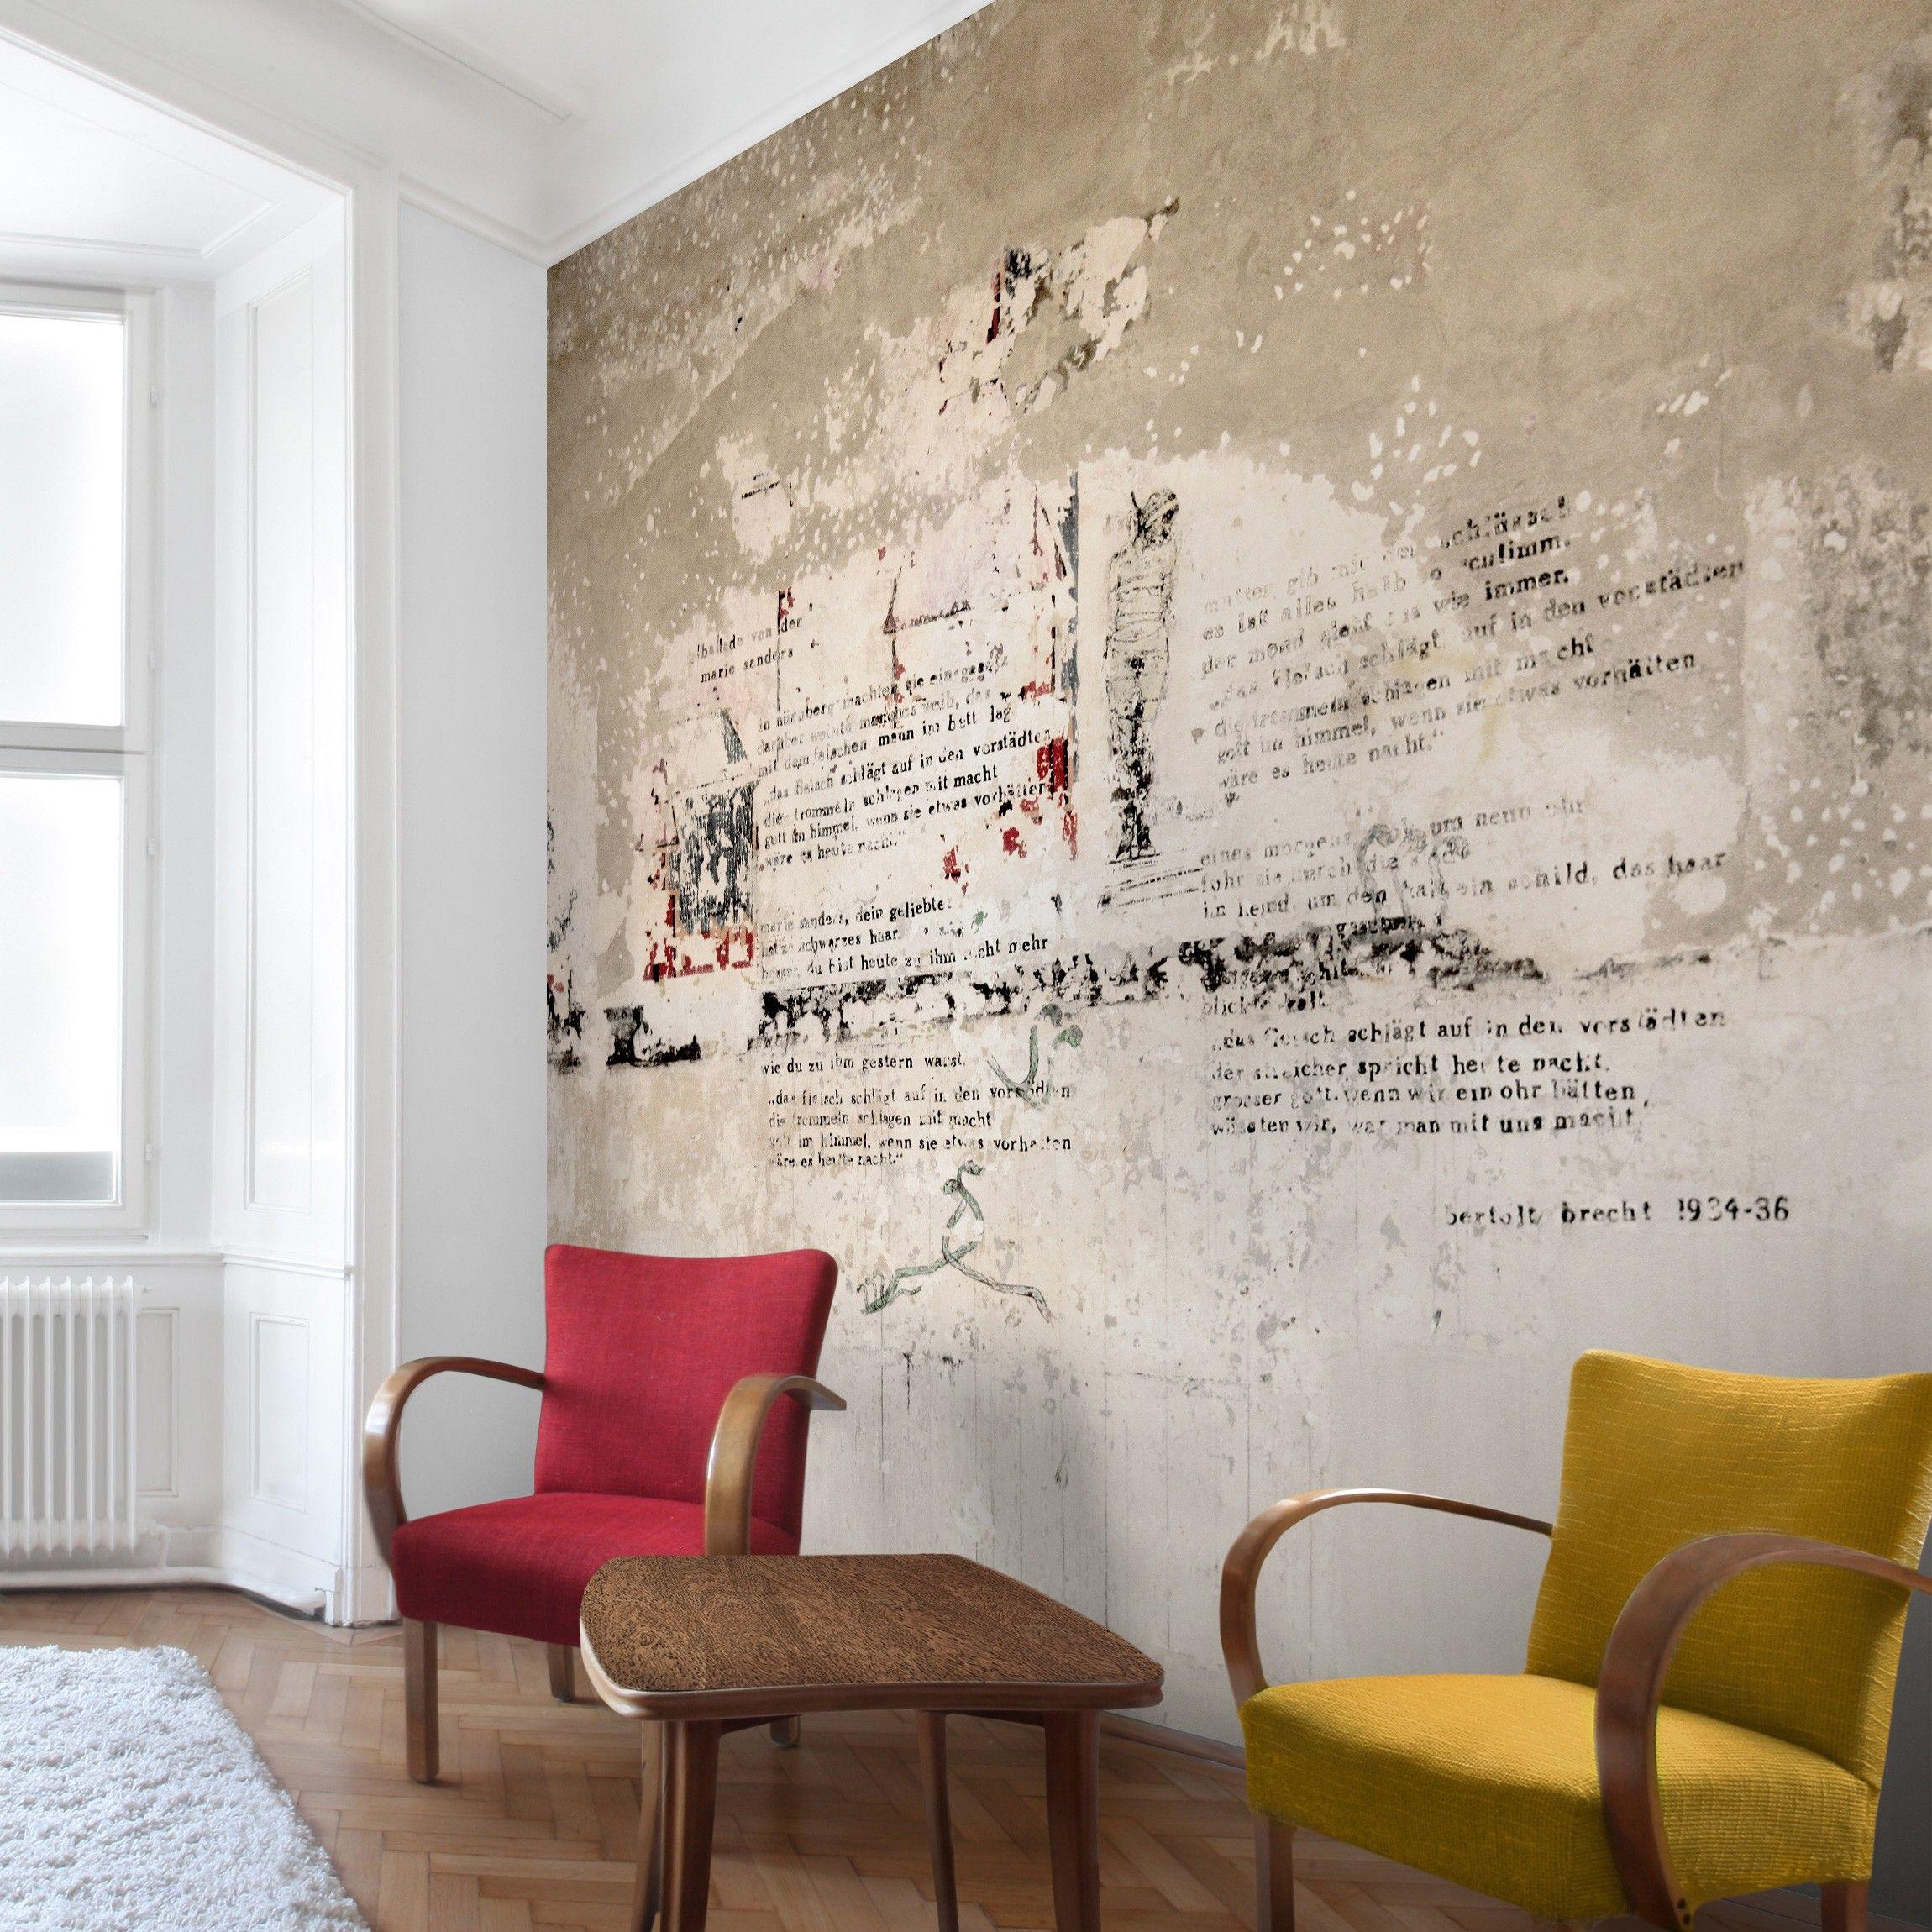 Alte Betonwand Mit Bertolt Brecht